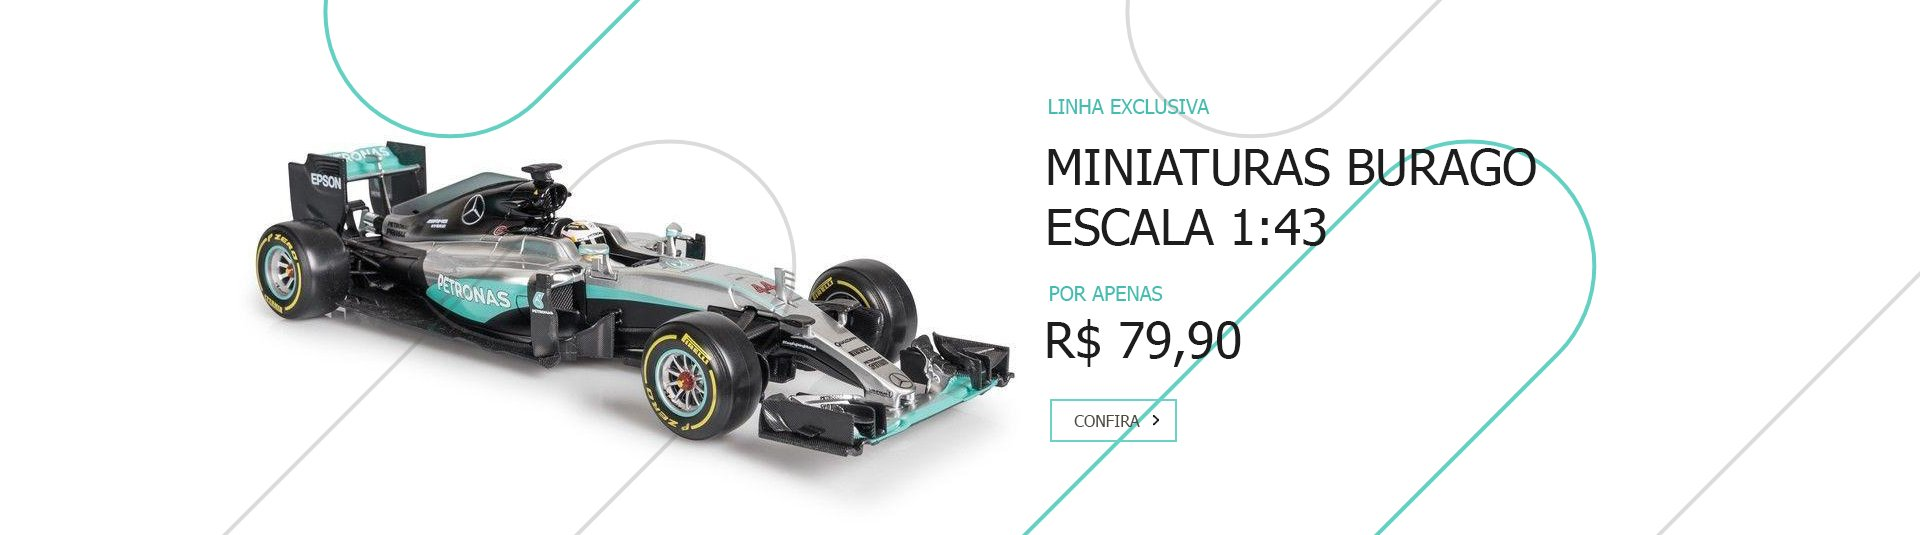 Miniaturas Burago